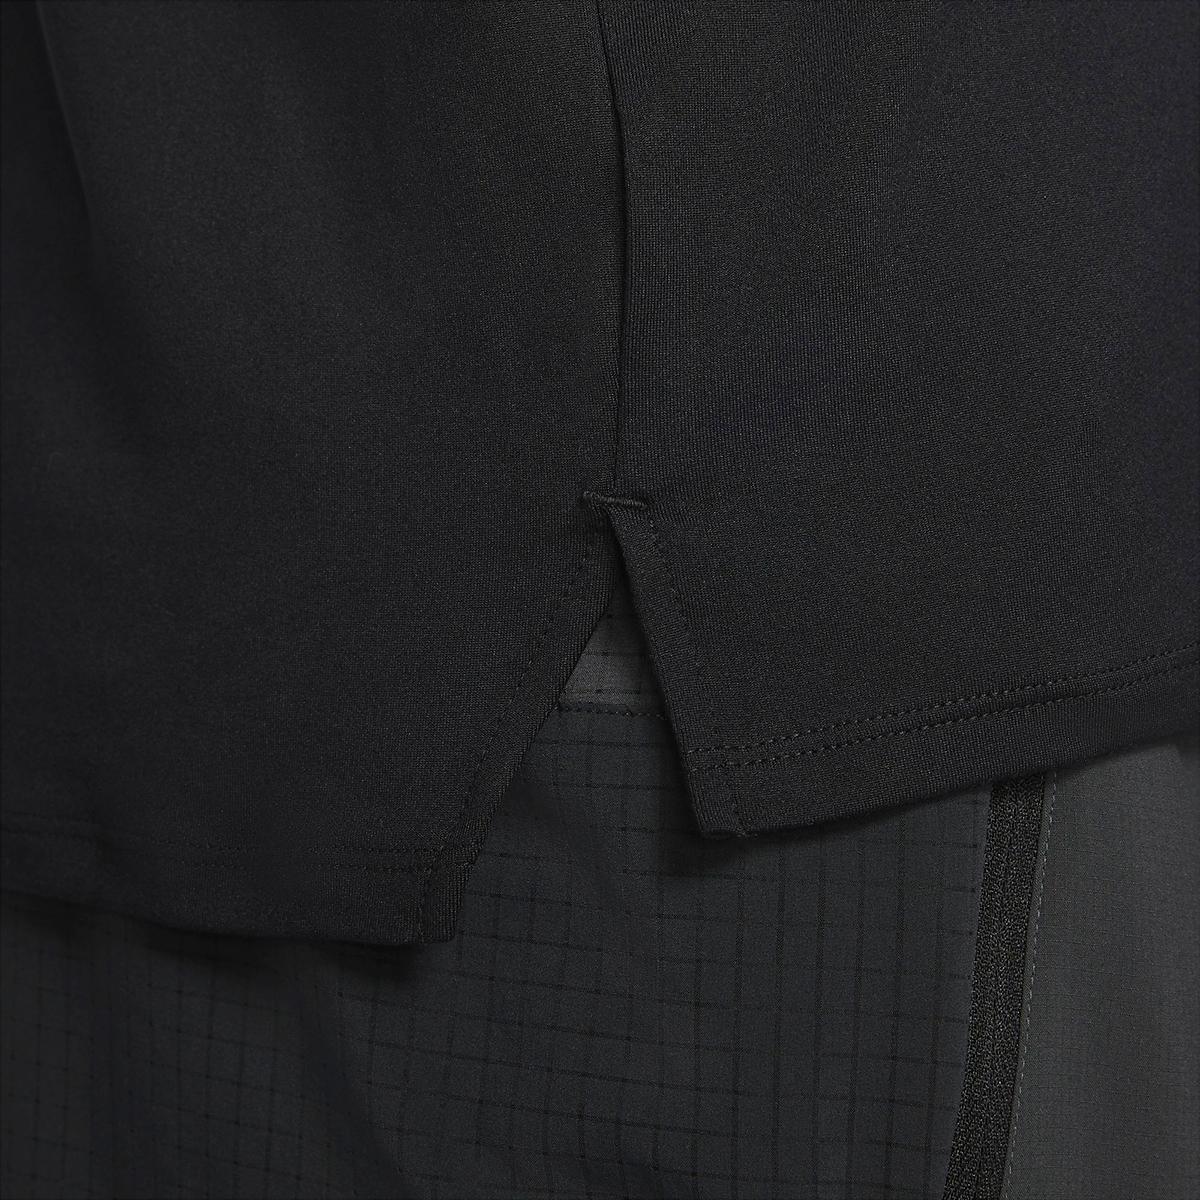 Men's Nike Dri-FIT Element 1/2-Zip Trail Running Top - Color: Black/Black/Dark Smoke Grey/White - Size: XS, Black/Black/Dark Smoke Grey/White, large, image 5